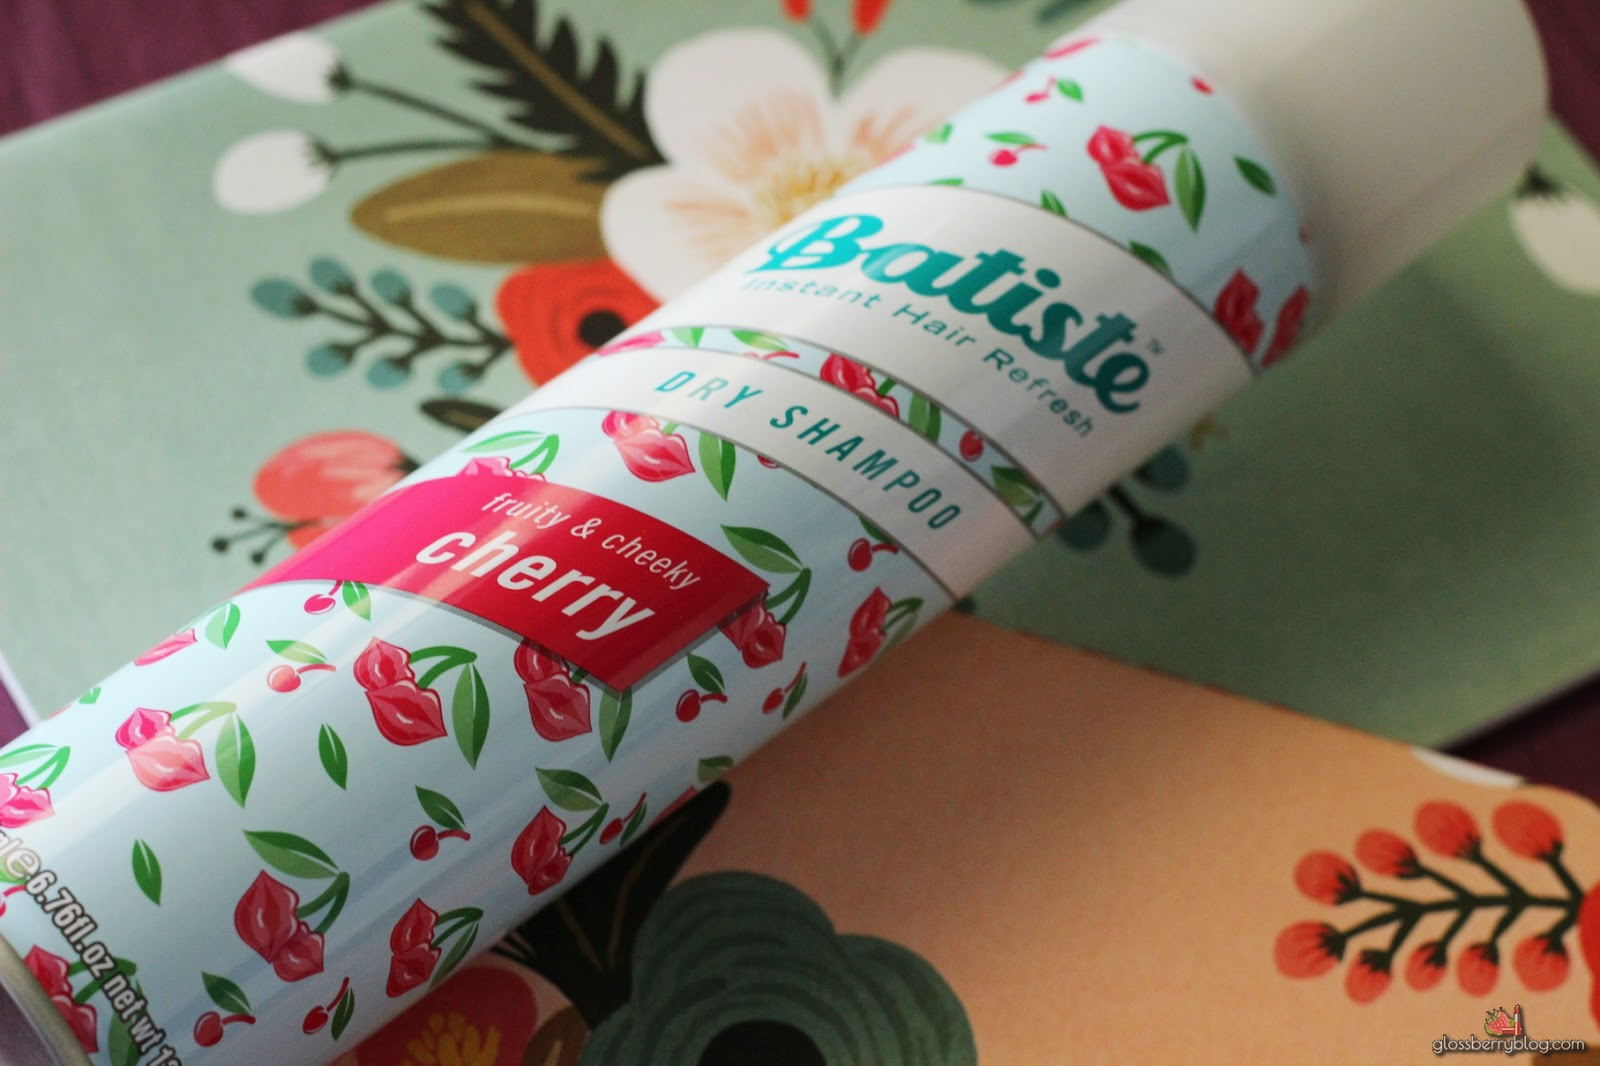 Batiste - Dry Shampoo - Fruity and Cheeky Cherry review סקירה המלצות שמפו יבש בטיסט דובדבן גלוסברי בלוג איפור וטיפוח